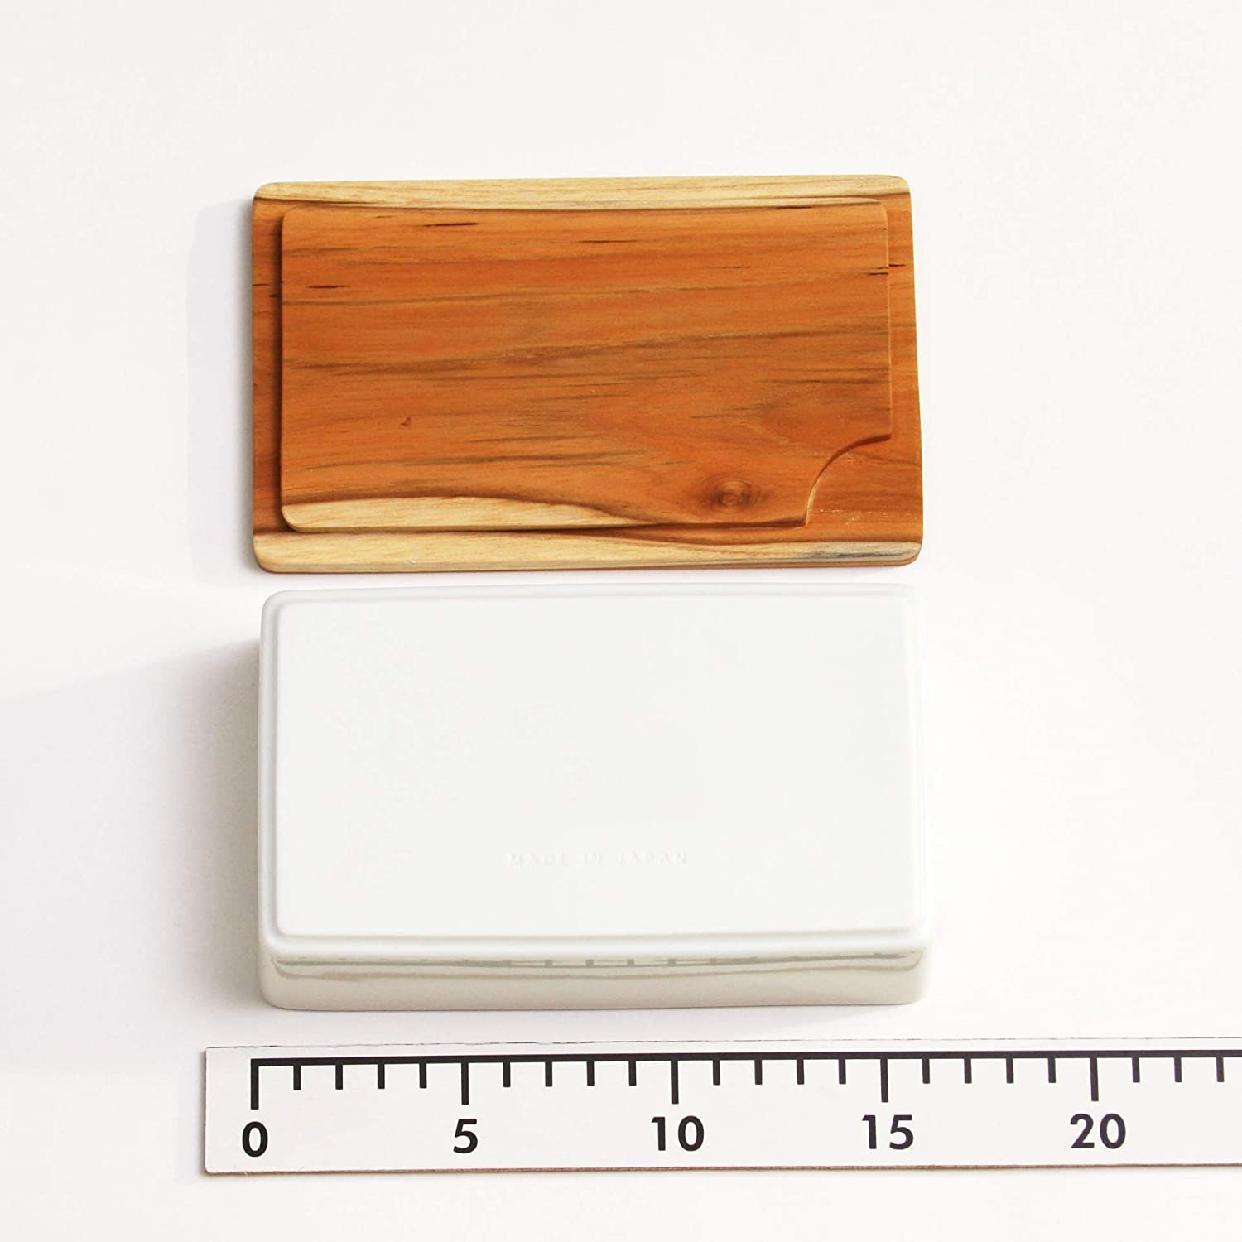 B STYLE KITCHEN(ビースタイルキッチン)木製バターケース 32401の商品画像3